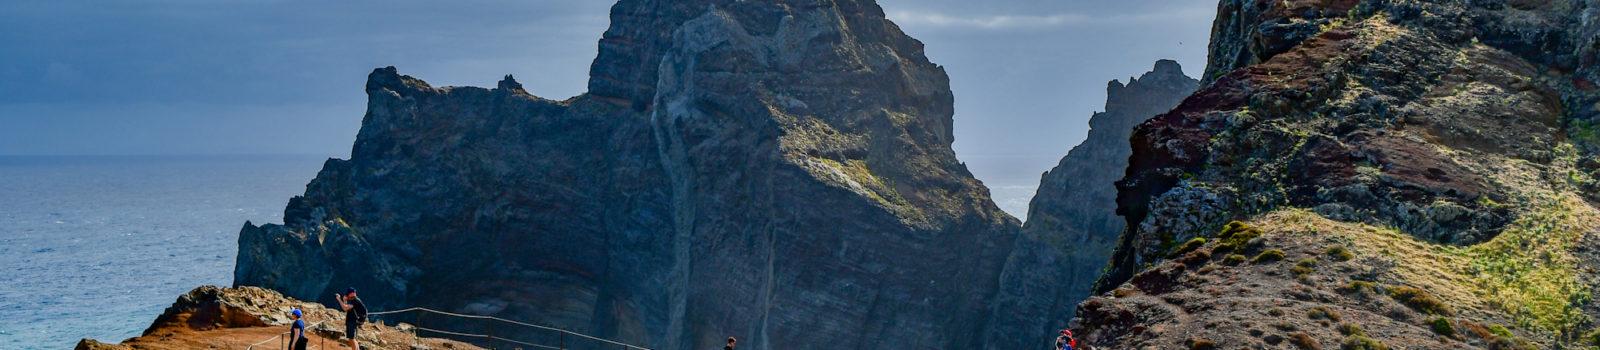 Bildergalerie Wanderurlaub Madeira